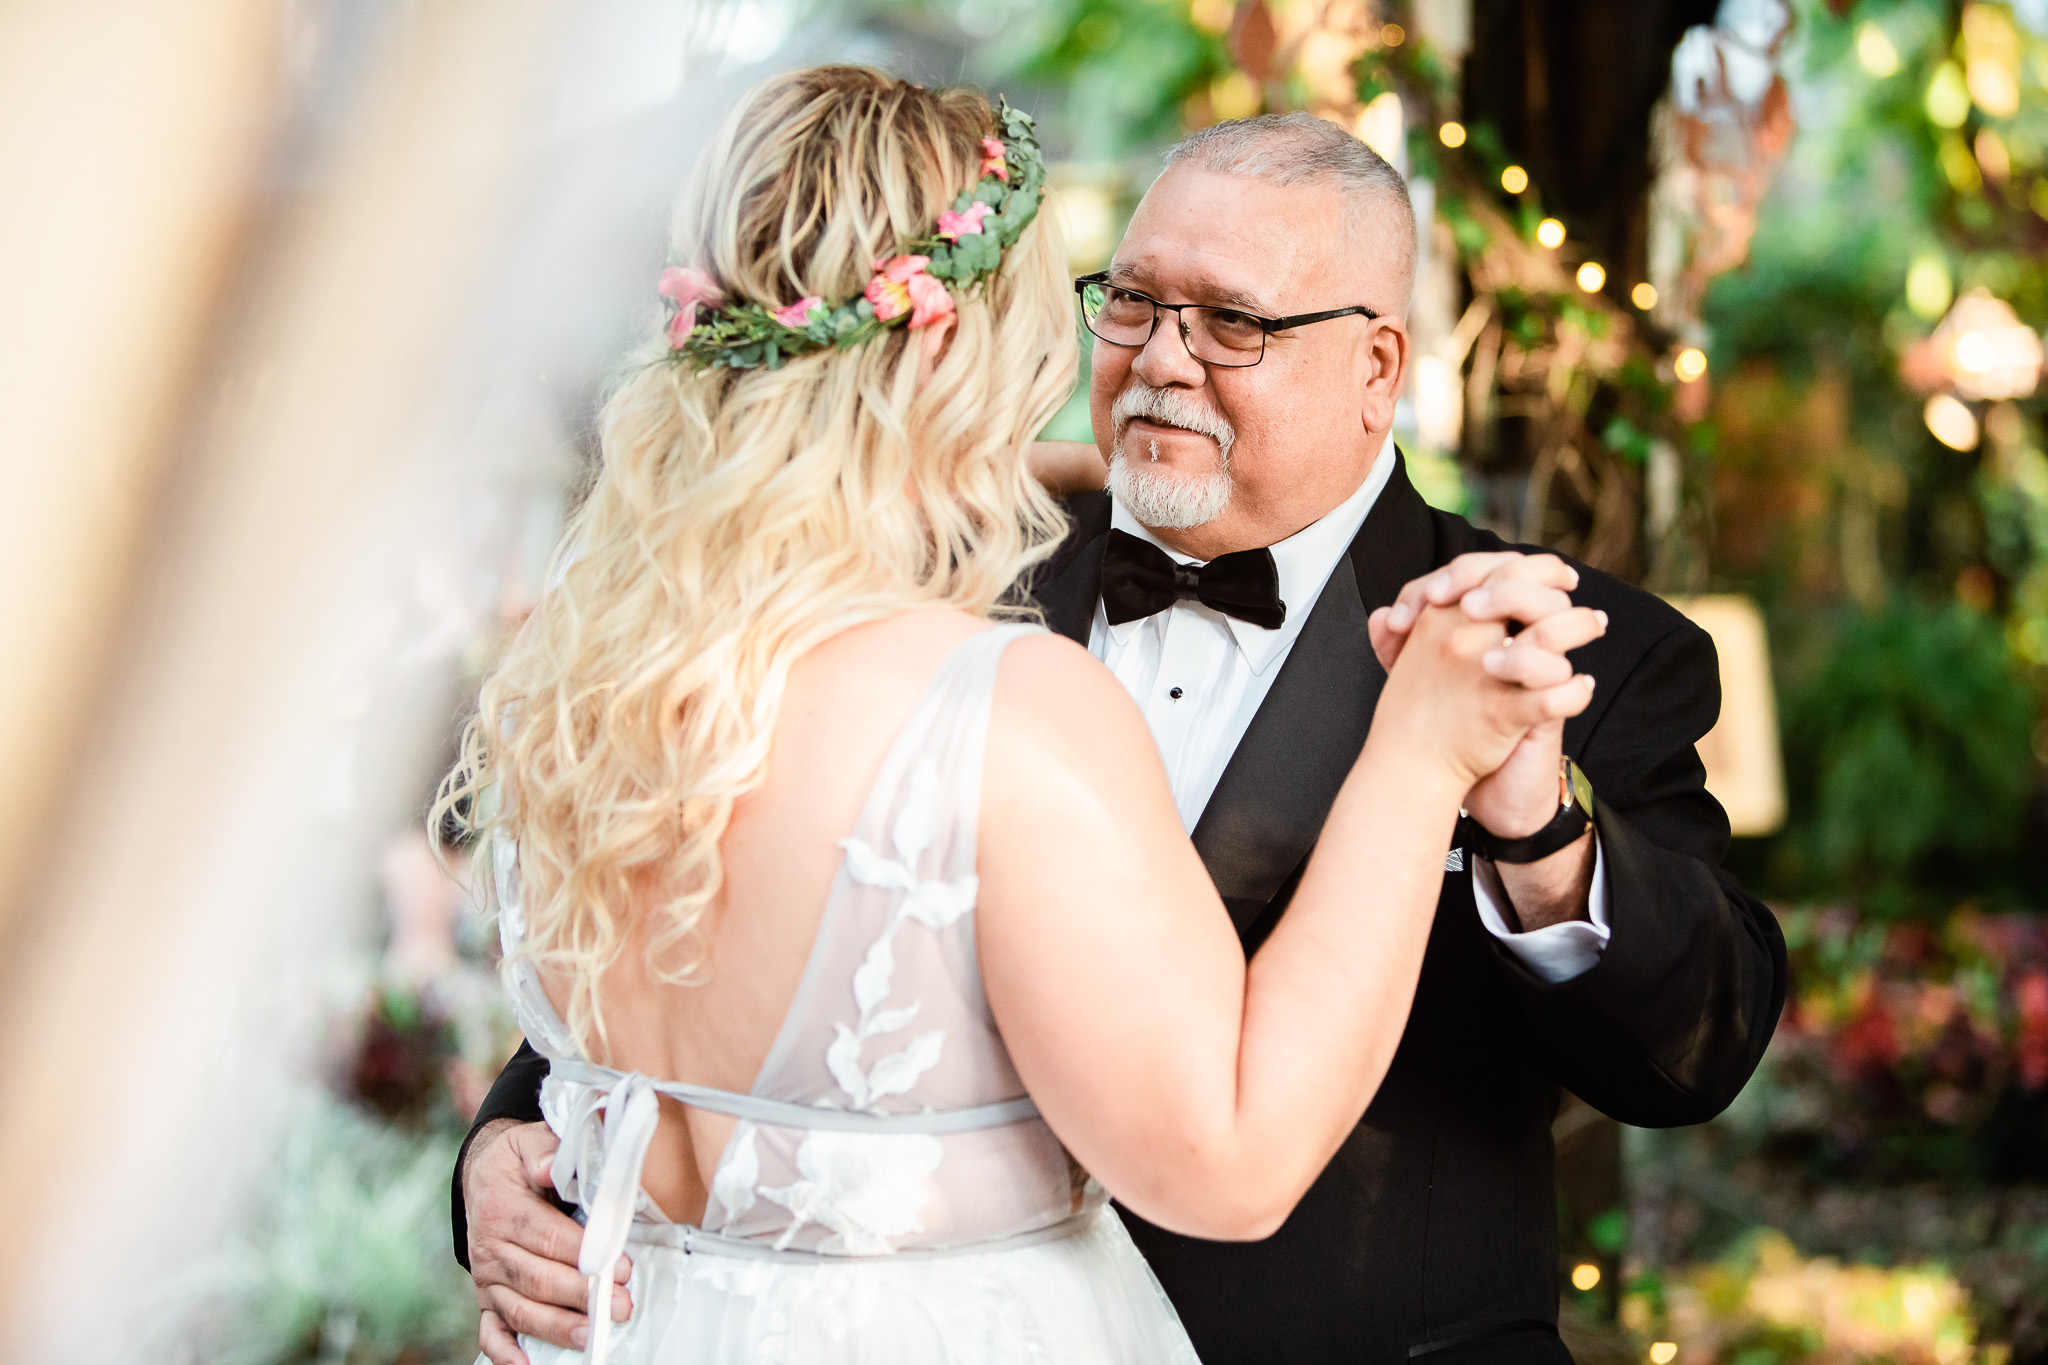 TAMPA_WEDDING_GIGIS_COUNTRY_GARDEN_CJMZ_TJL48556.jpg